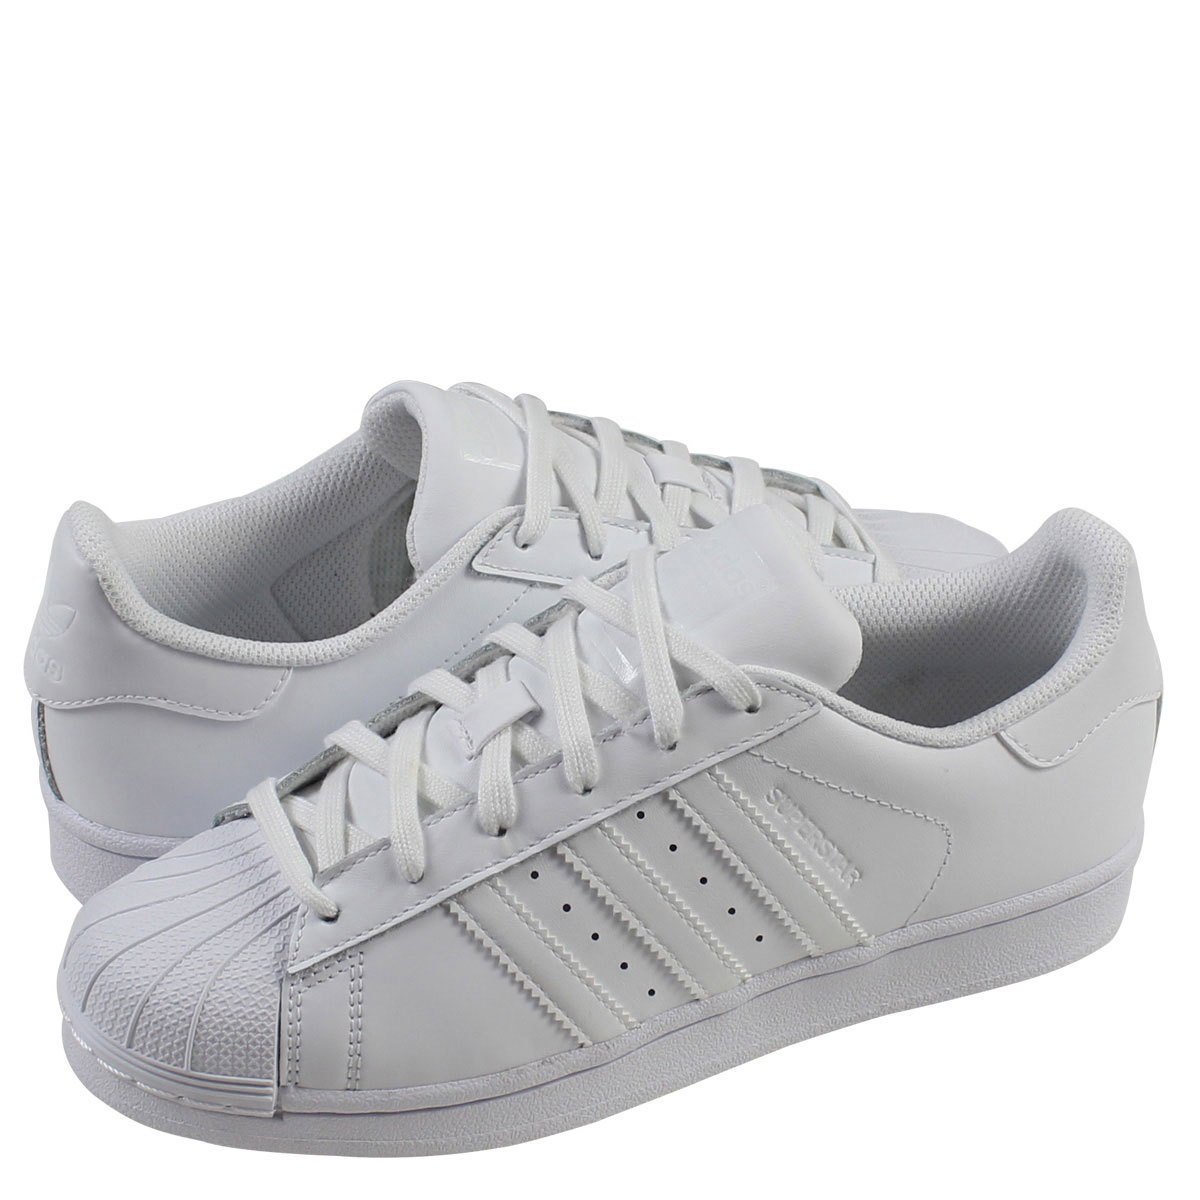 ... top quality allsports laquopre order itemsraquo laquo7 31 days  stockraquo adidas originals adidas originals womens superstar 9c5f14859